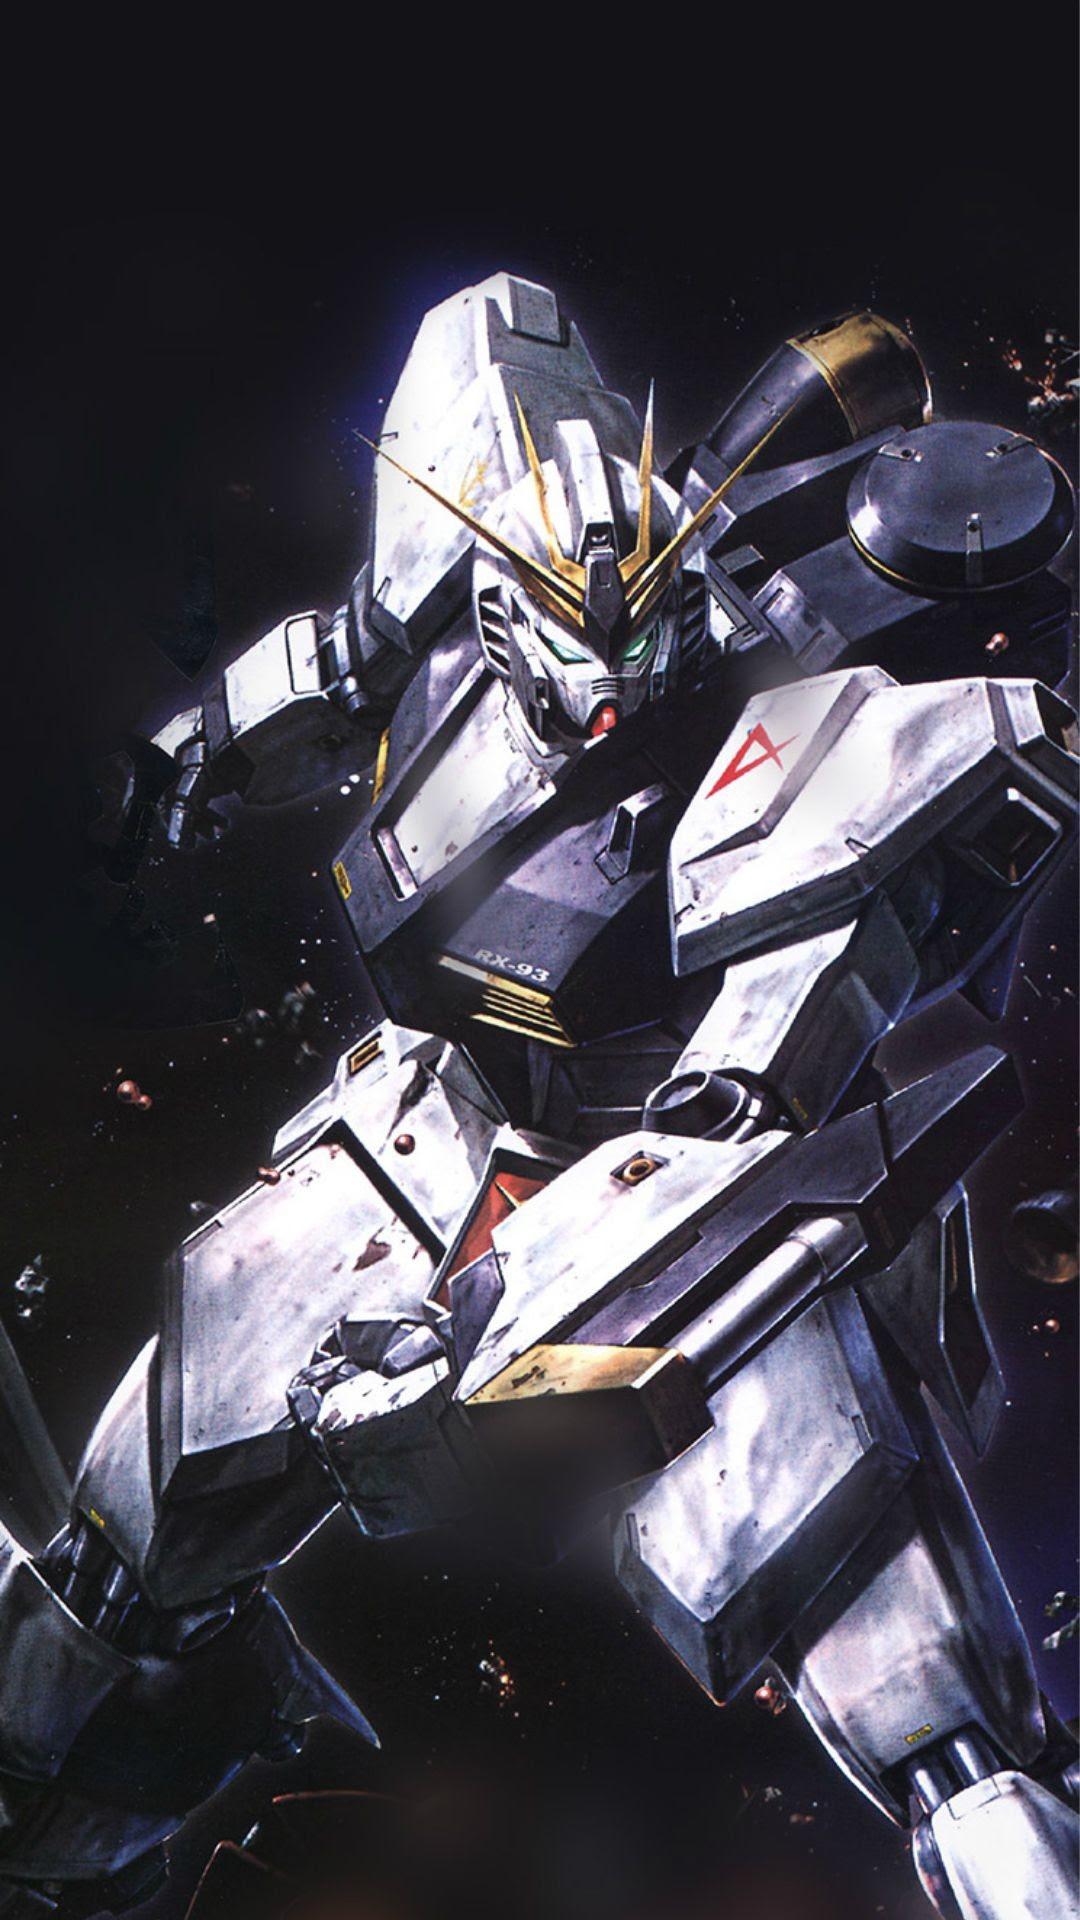 Gundam Iphone Wallpaper 67 Images